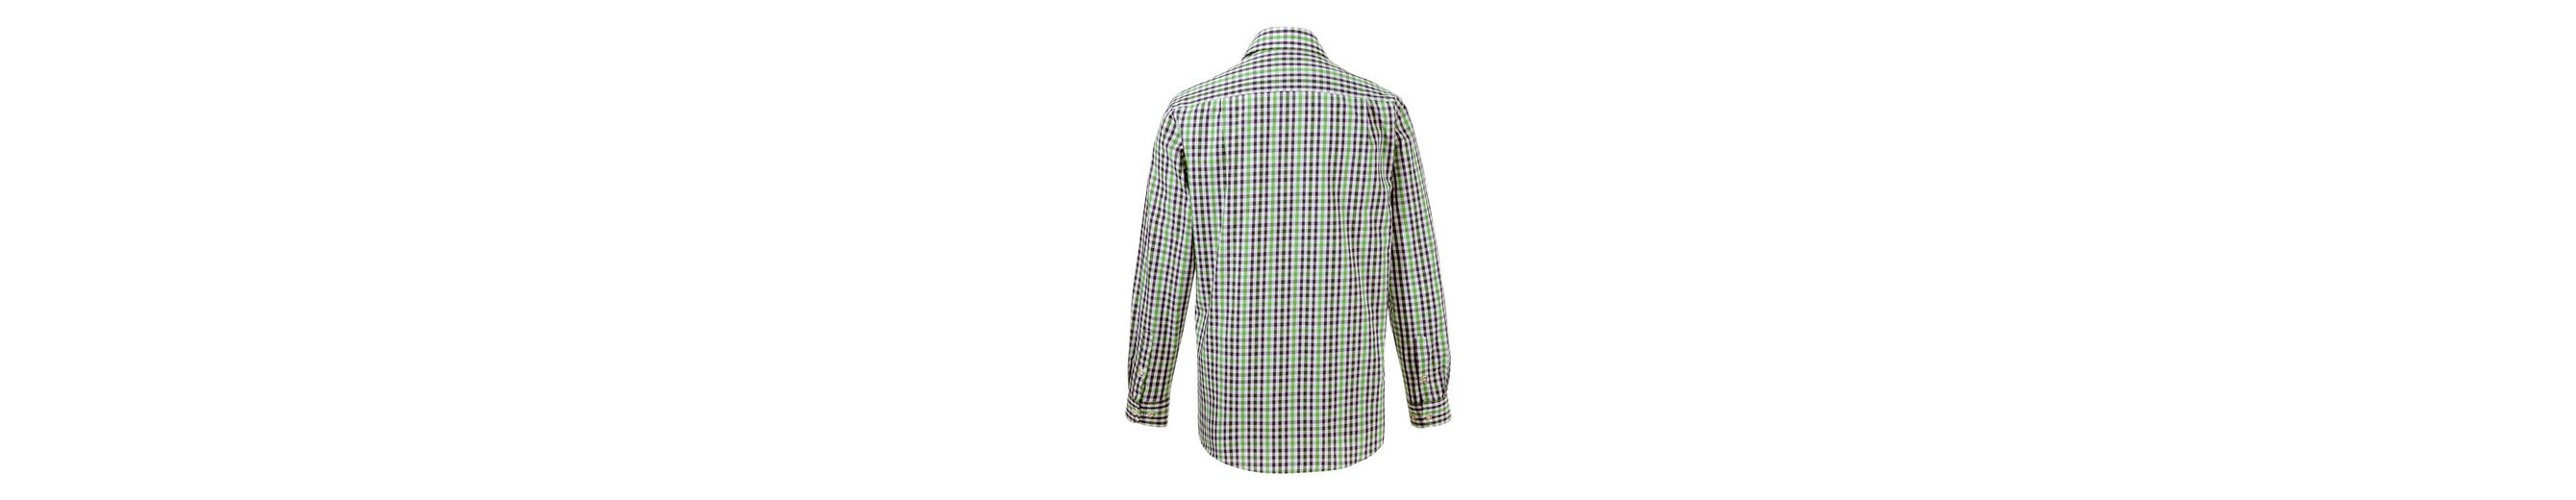 Almsach Trachtenhemd im Karo-Dessin Outlet Factory Outlet fUvDP